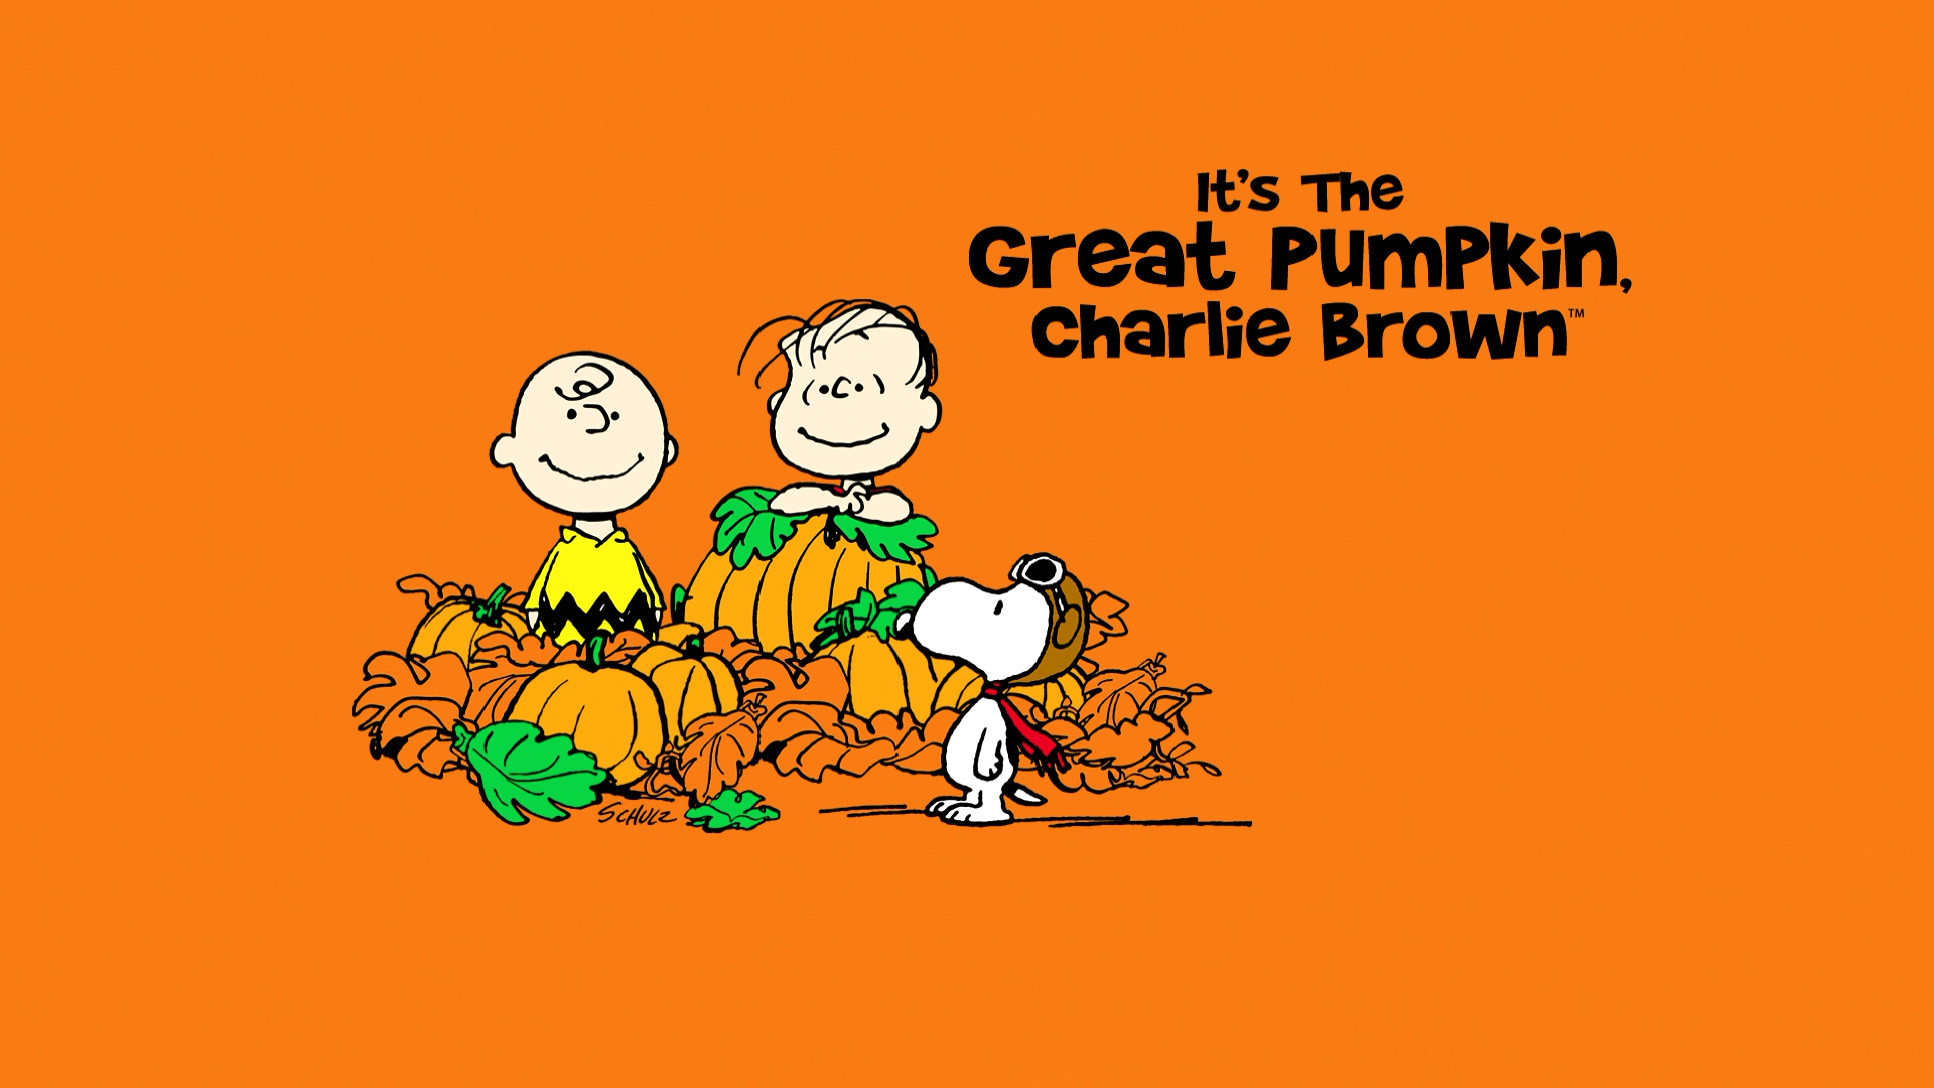 Free Snoopy Fall Wallpaper Great Pumpkin Charlie Brown Wallpaper 183 ① Wallpapertag